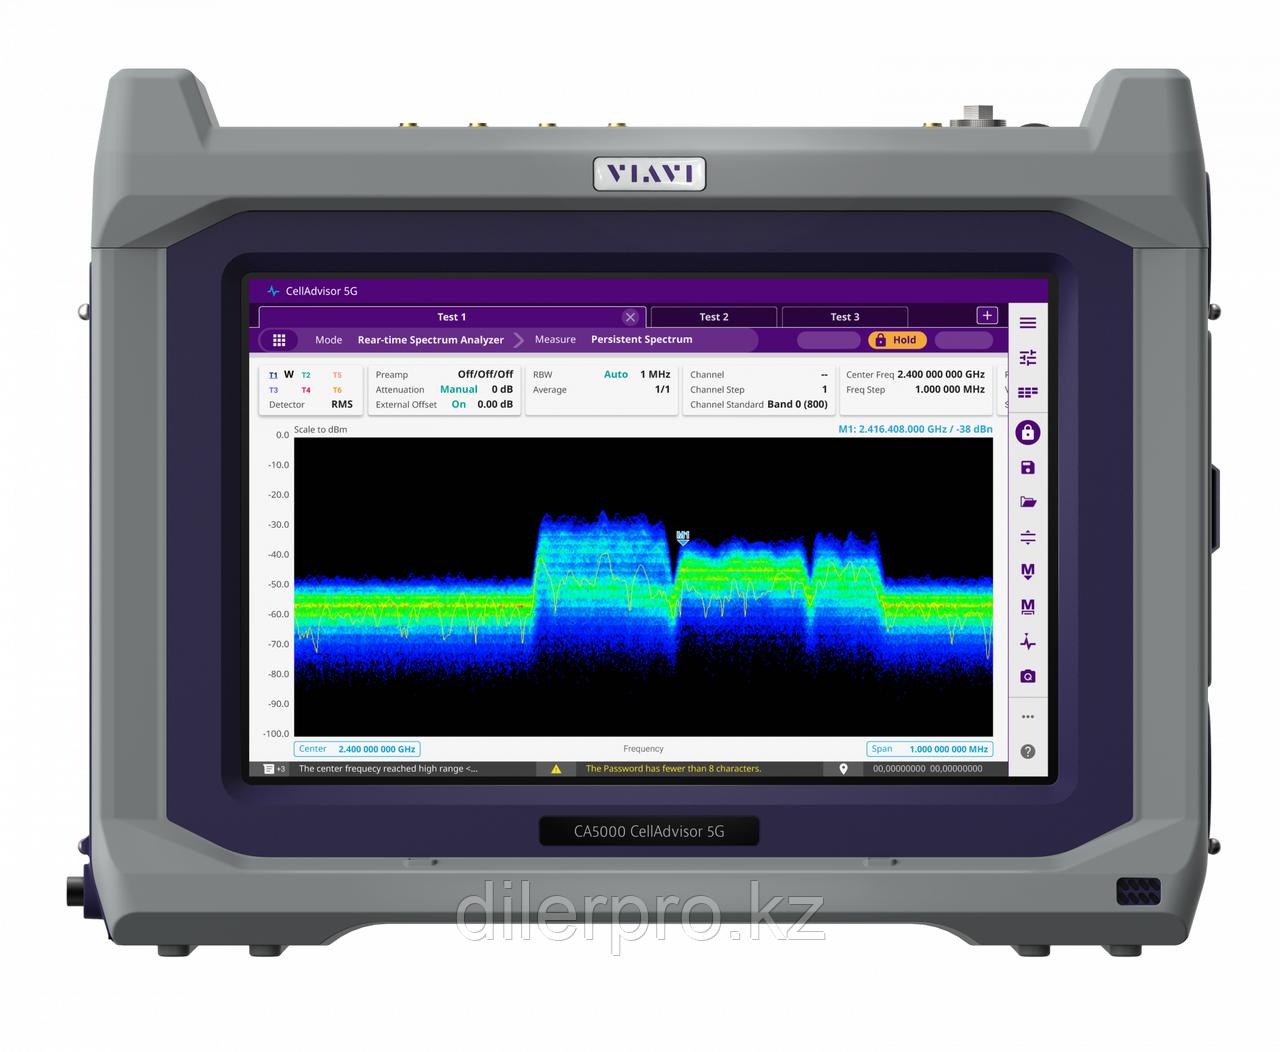 VIAVI CellAdvisor 5G CA5000-F002 - анализатор базовых станций 5G (частотный диапазон от 9 кГц до 6 ГГц и от 24